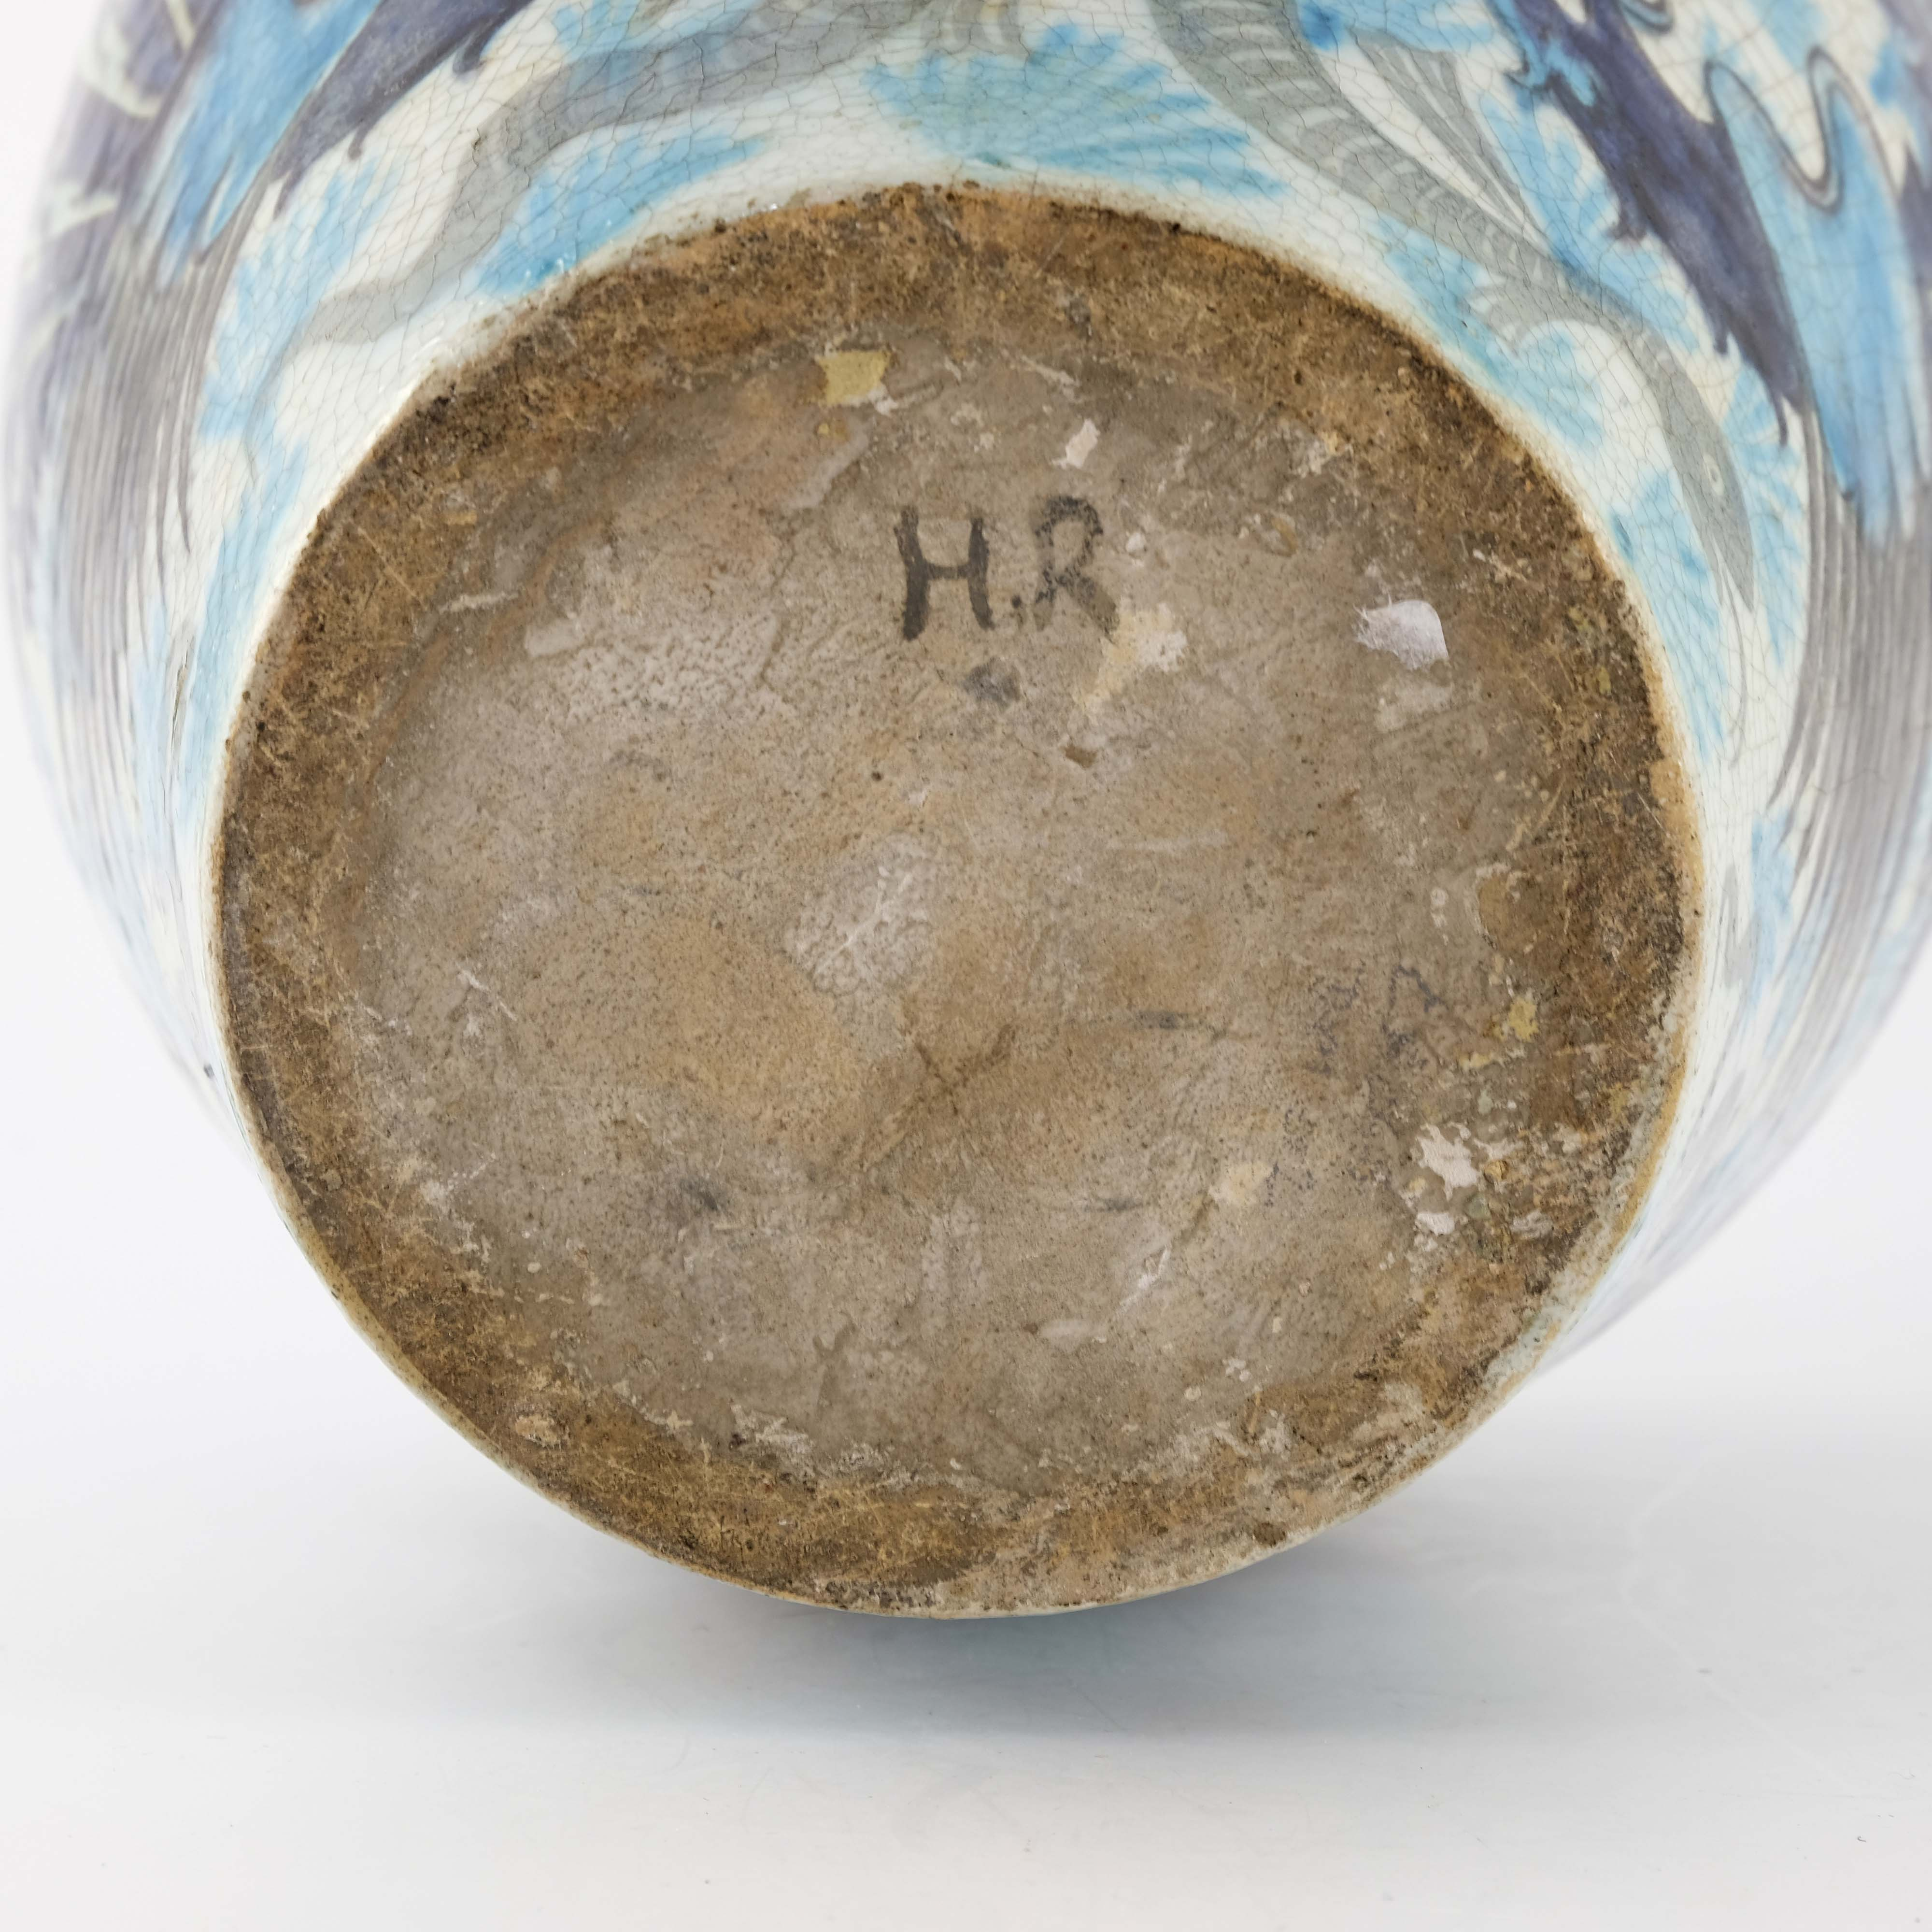 Halsey Ricardo for William De Morgan, a large Pers - Image 7 of 7